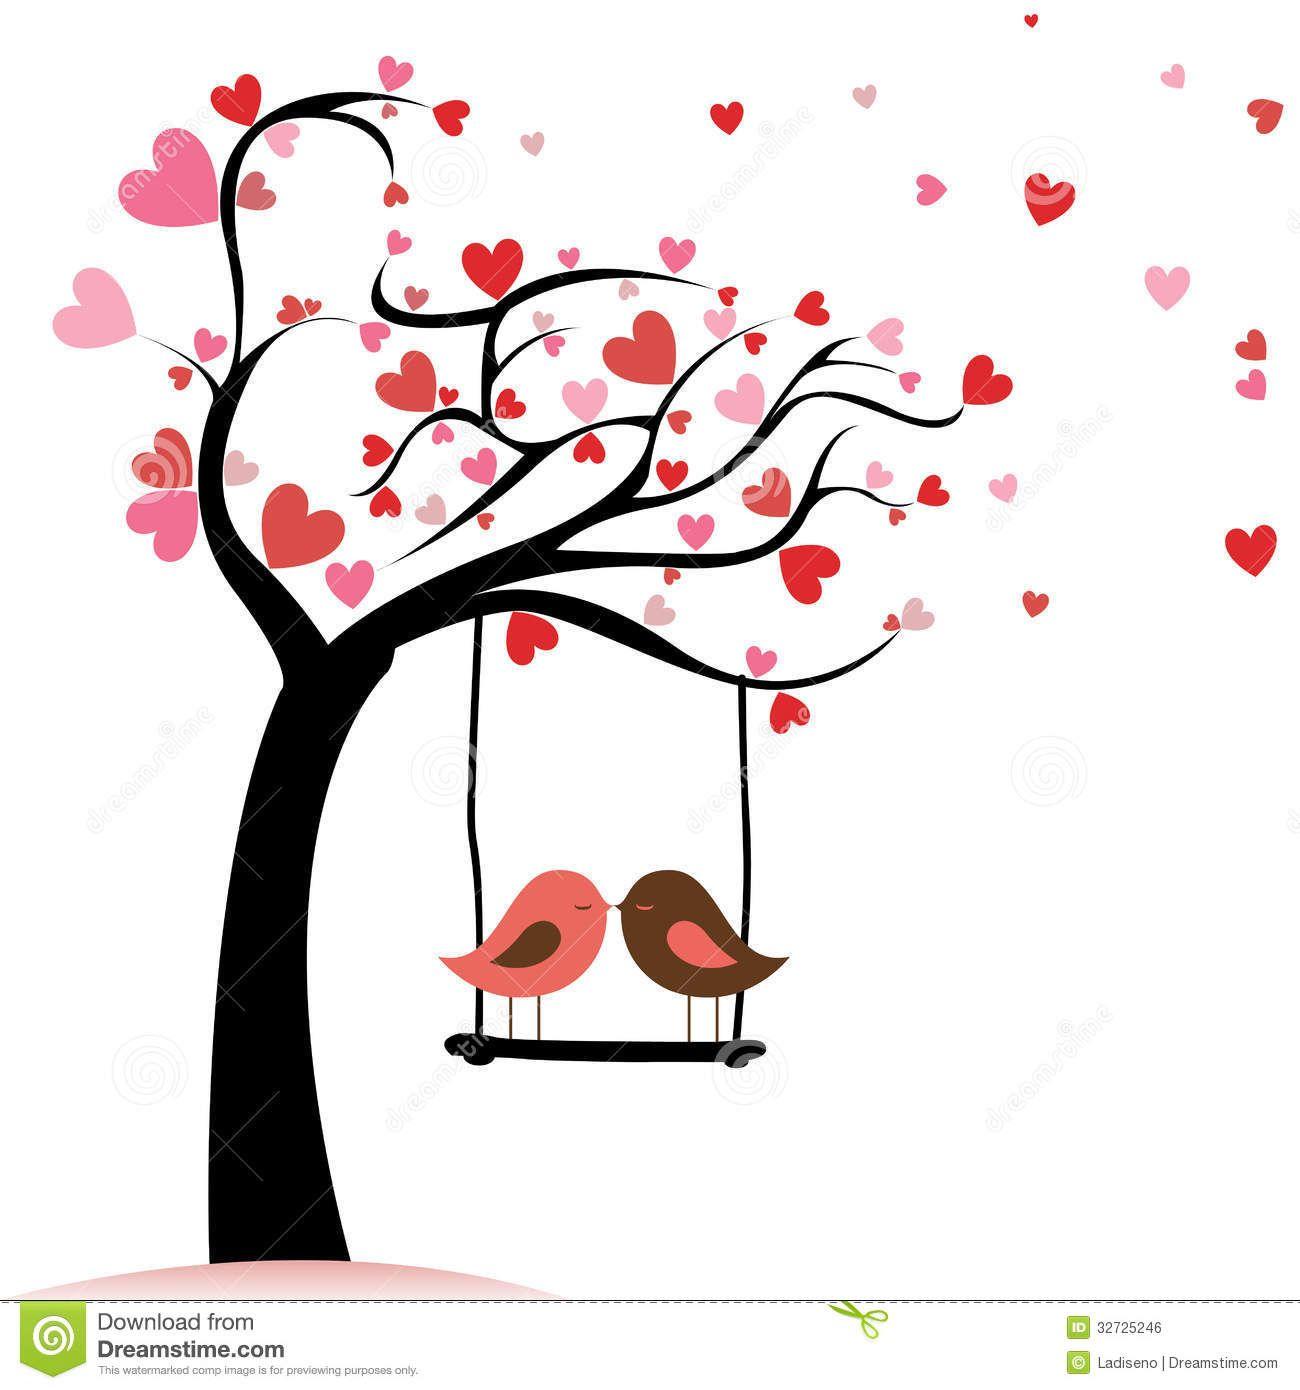 lovebirdstwoabstracttreeheartleaf32725246jpg 1300